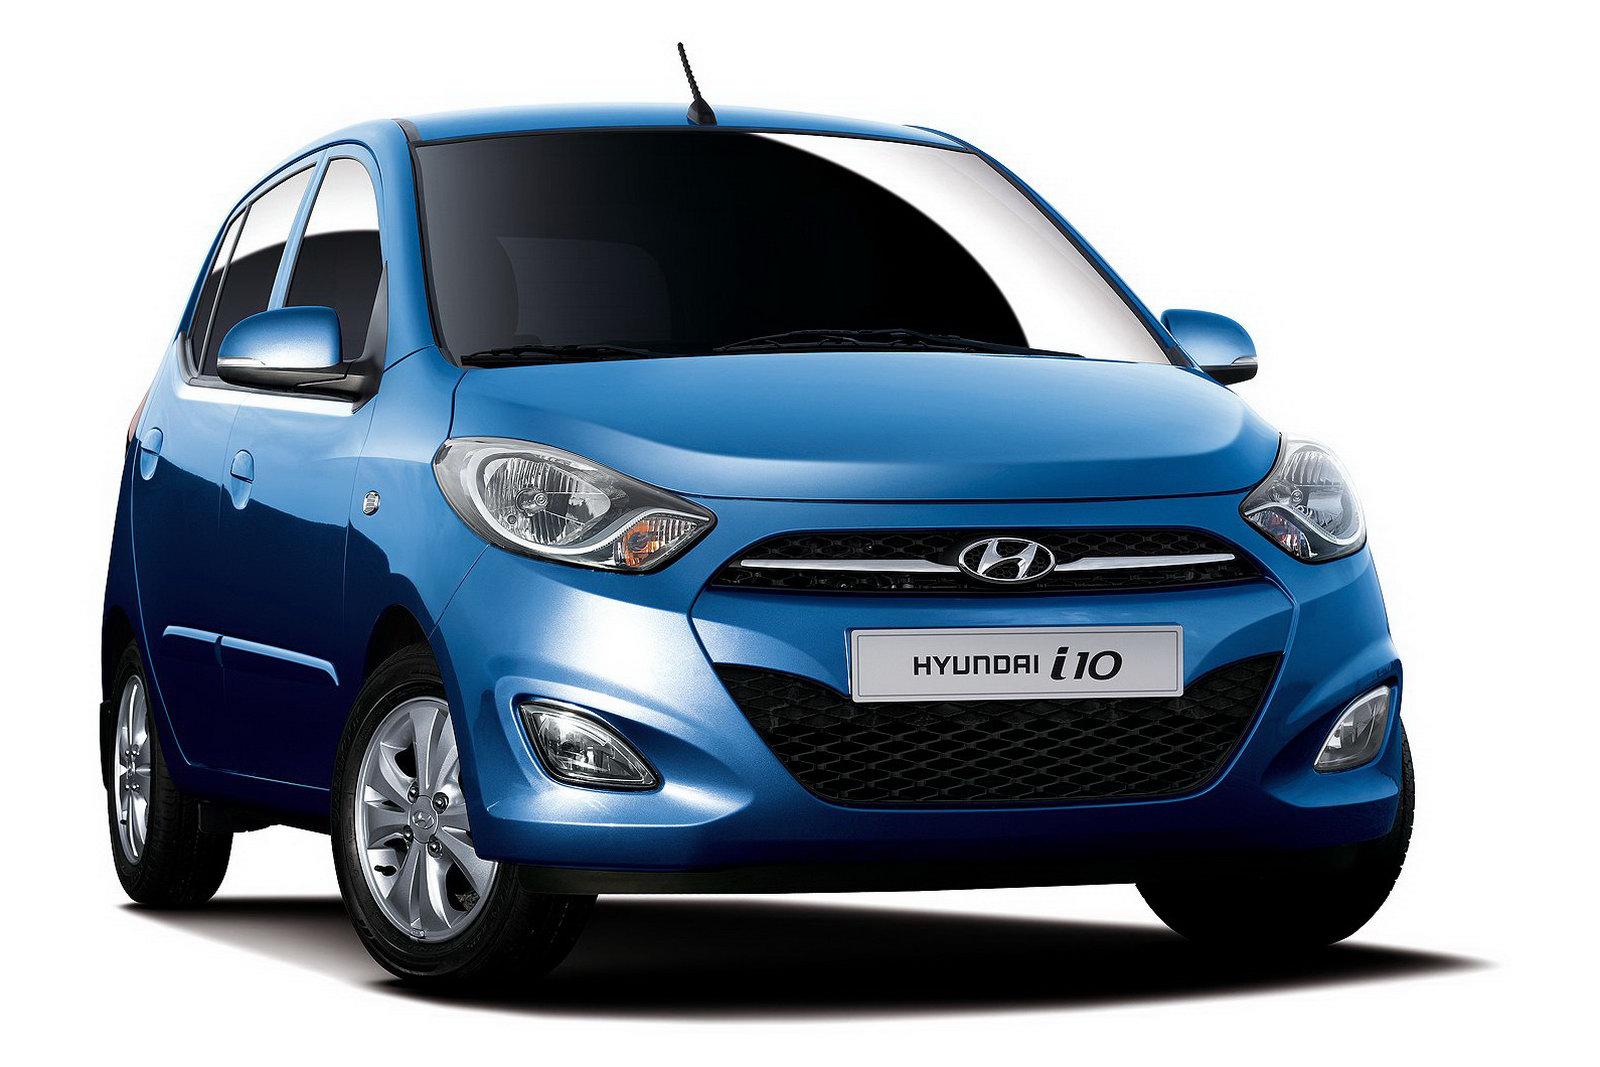 Hyundai i10 Not For Australia 4 Star NCAP The Reason Wallpapers HD